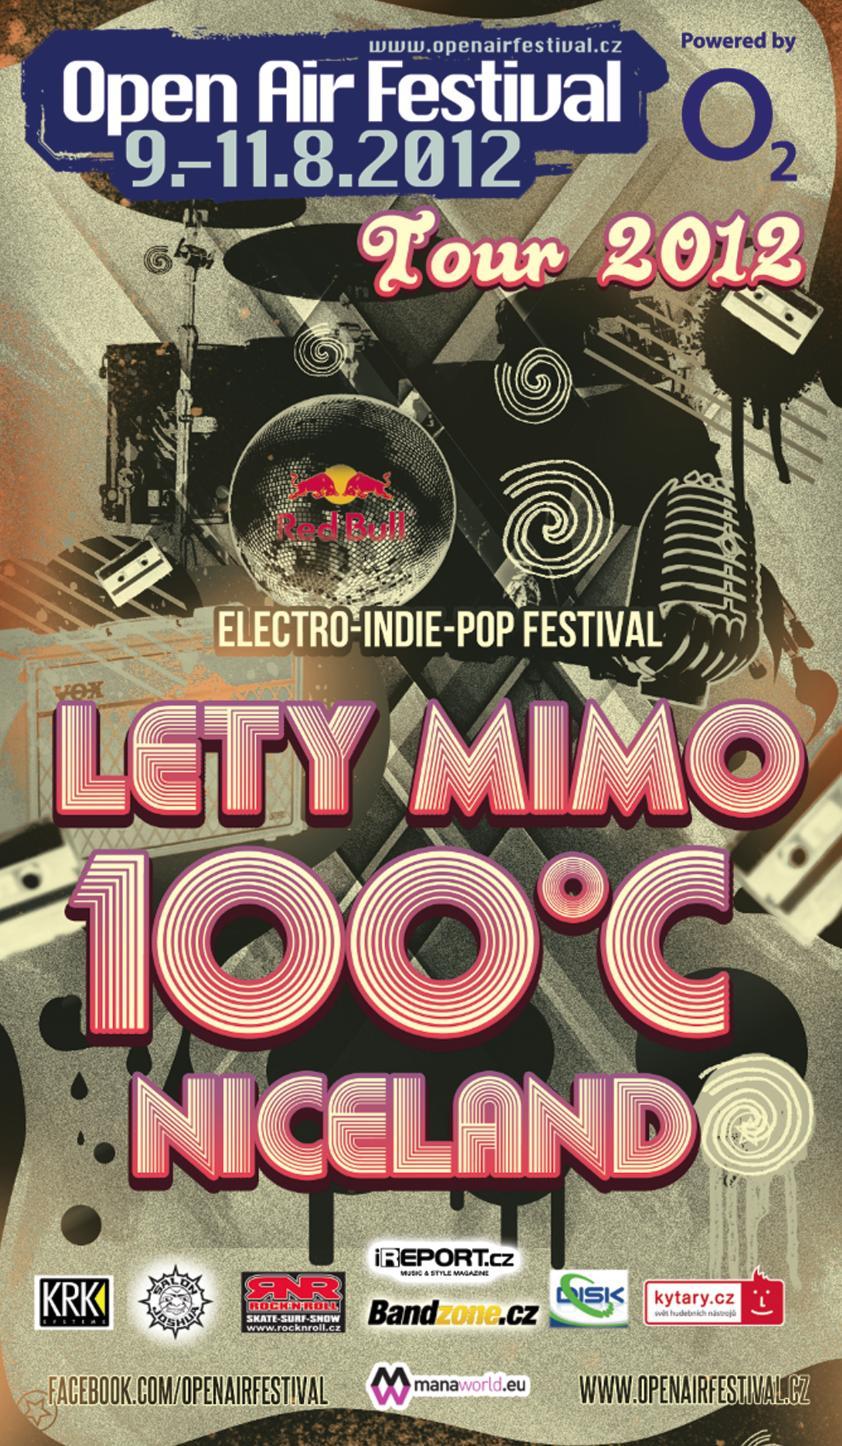 100°C, Lety Mimo a NiceLand vyrážejí na Open Air Festival Tour